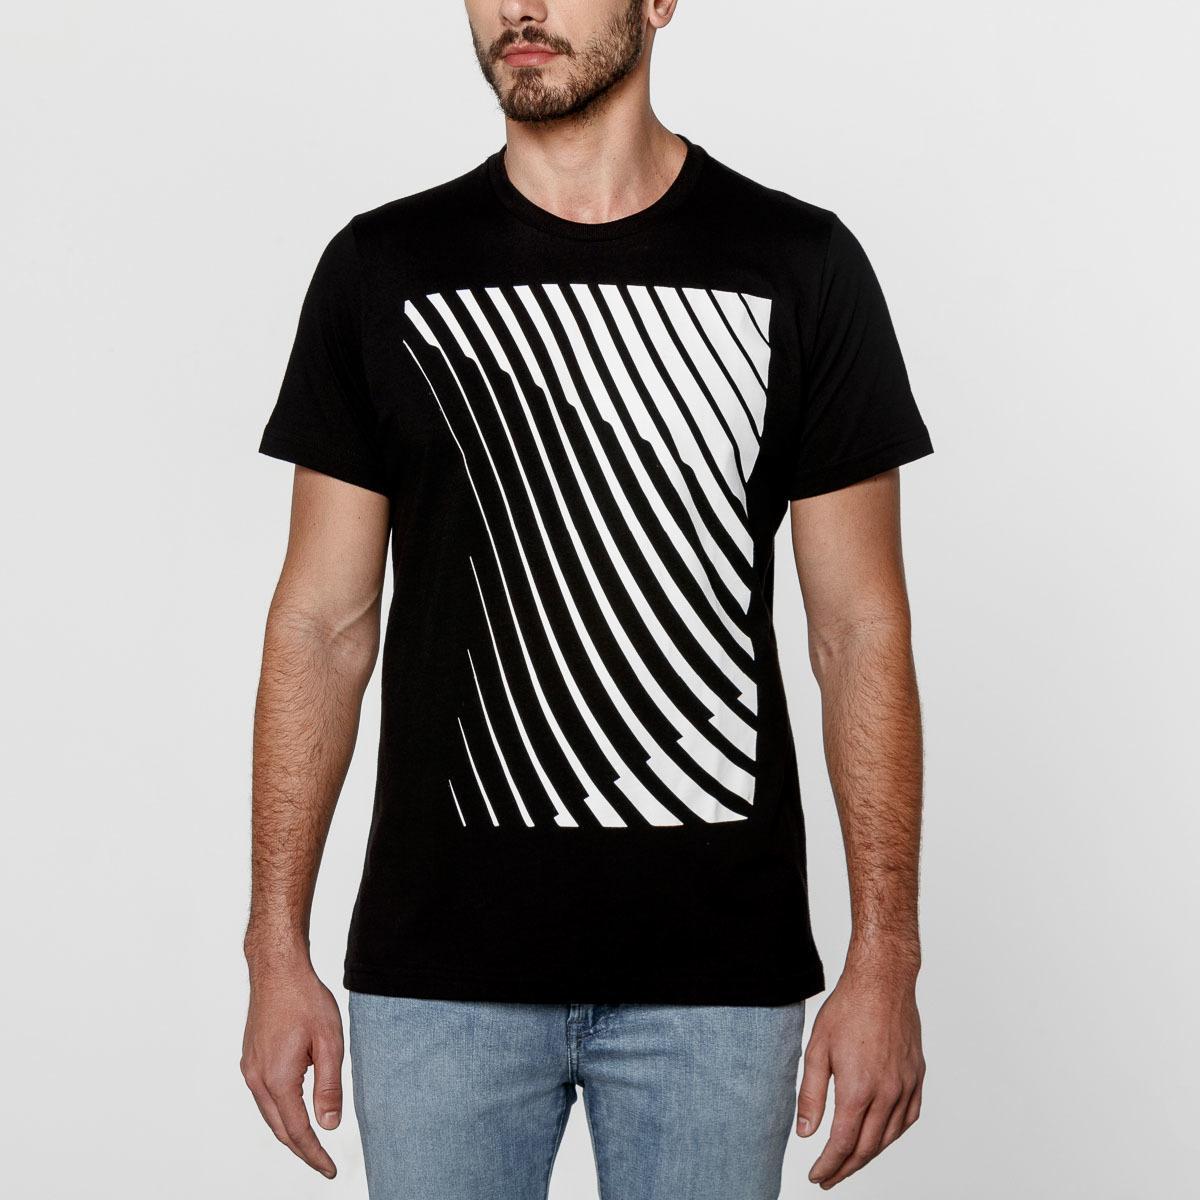 Camiseta Tresano Waves Slim Fit